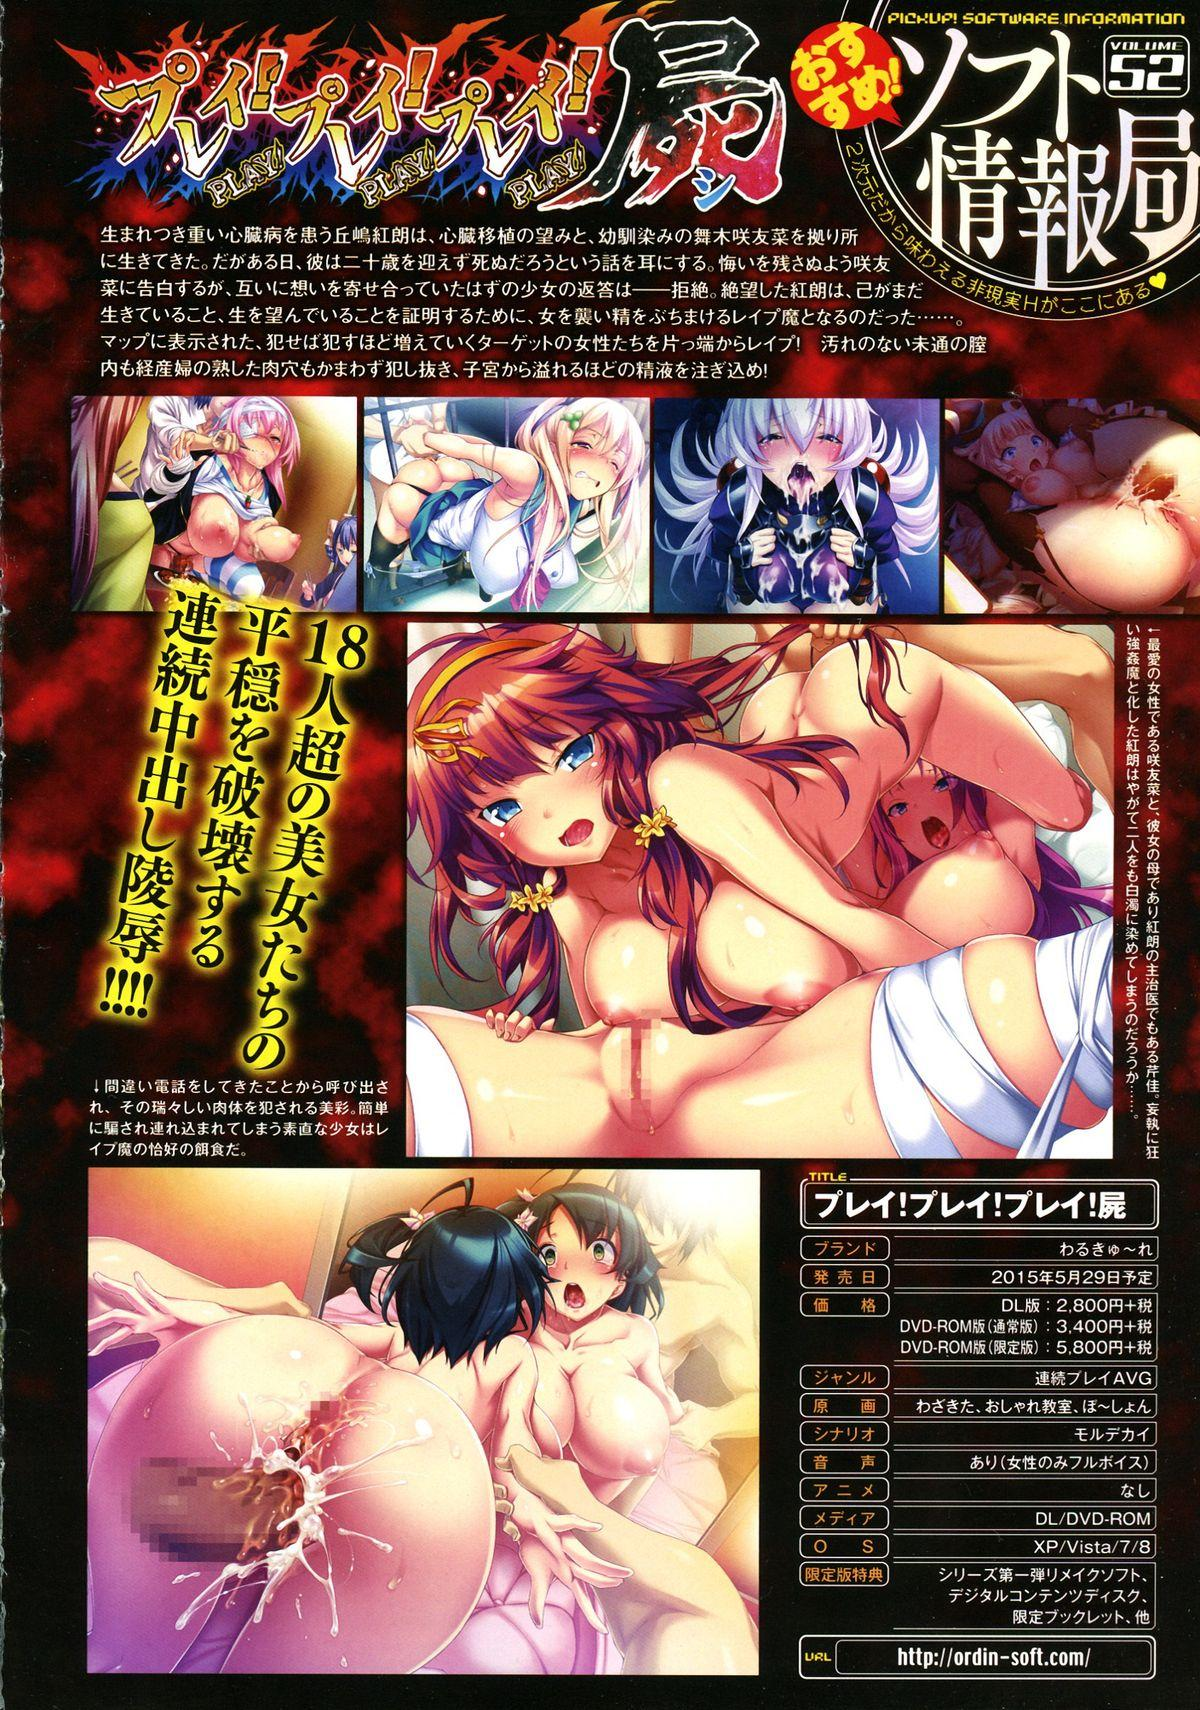 COMIC Unreal 2015-06 Vol. 55 + Hisasi Illust Shuu 32